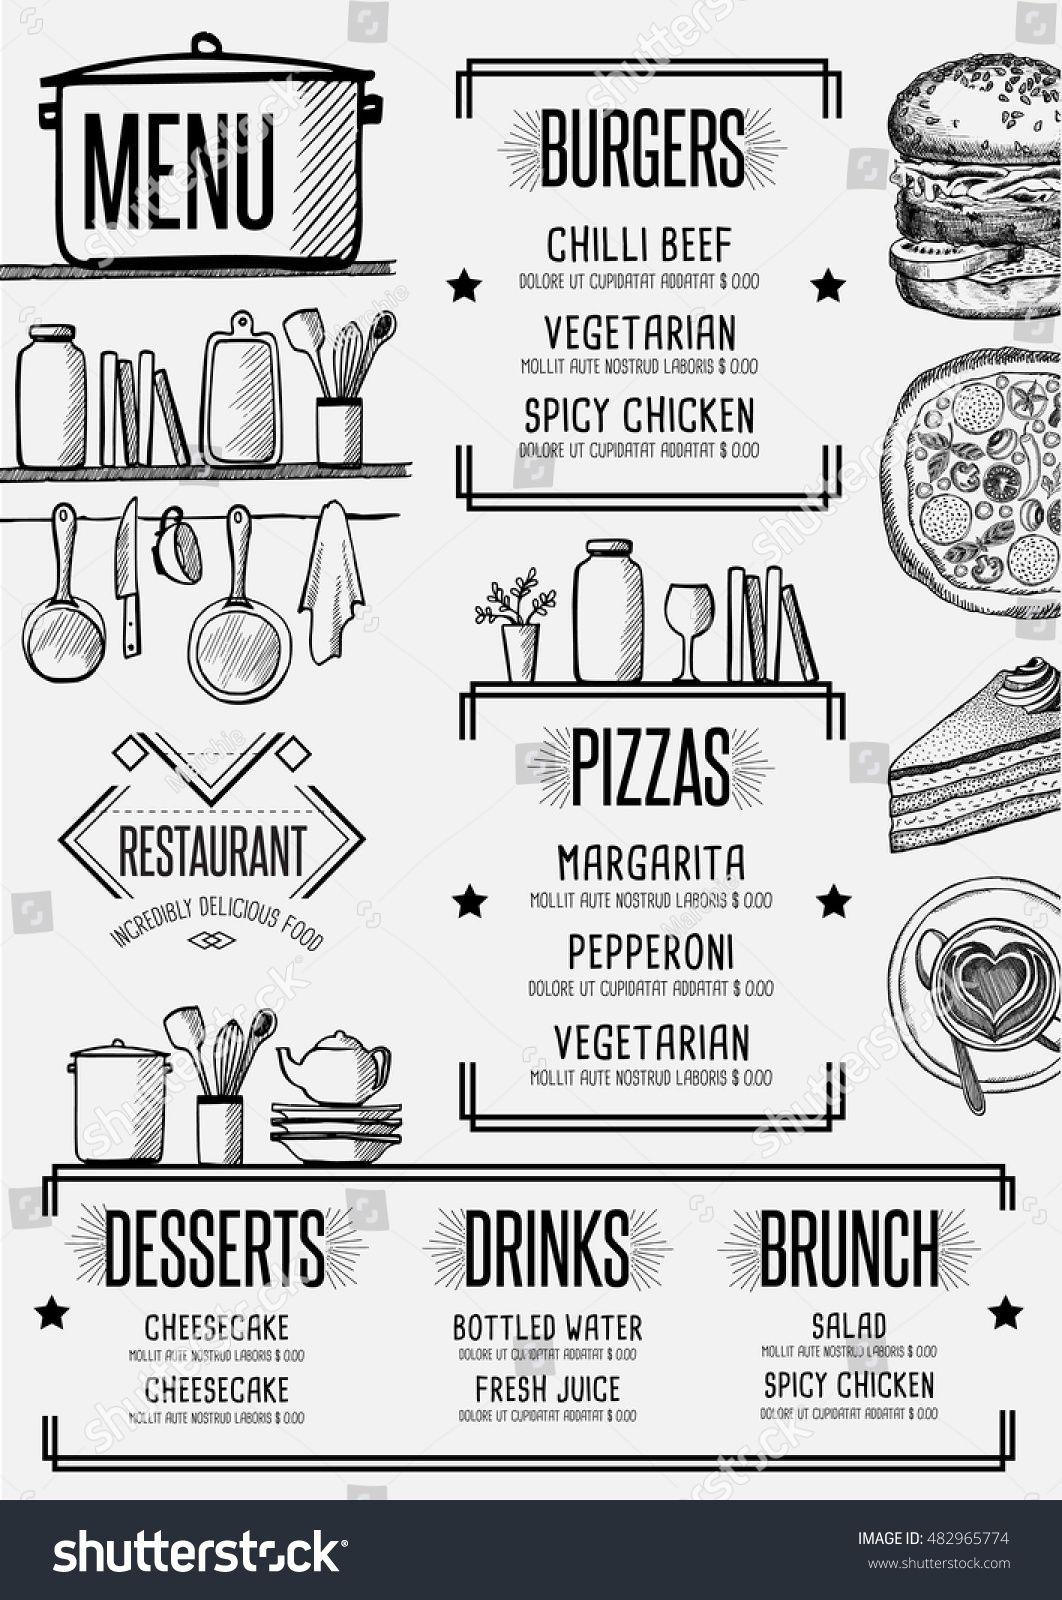 restaurant menu placemat food brochure cafe template design